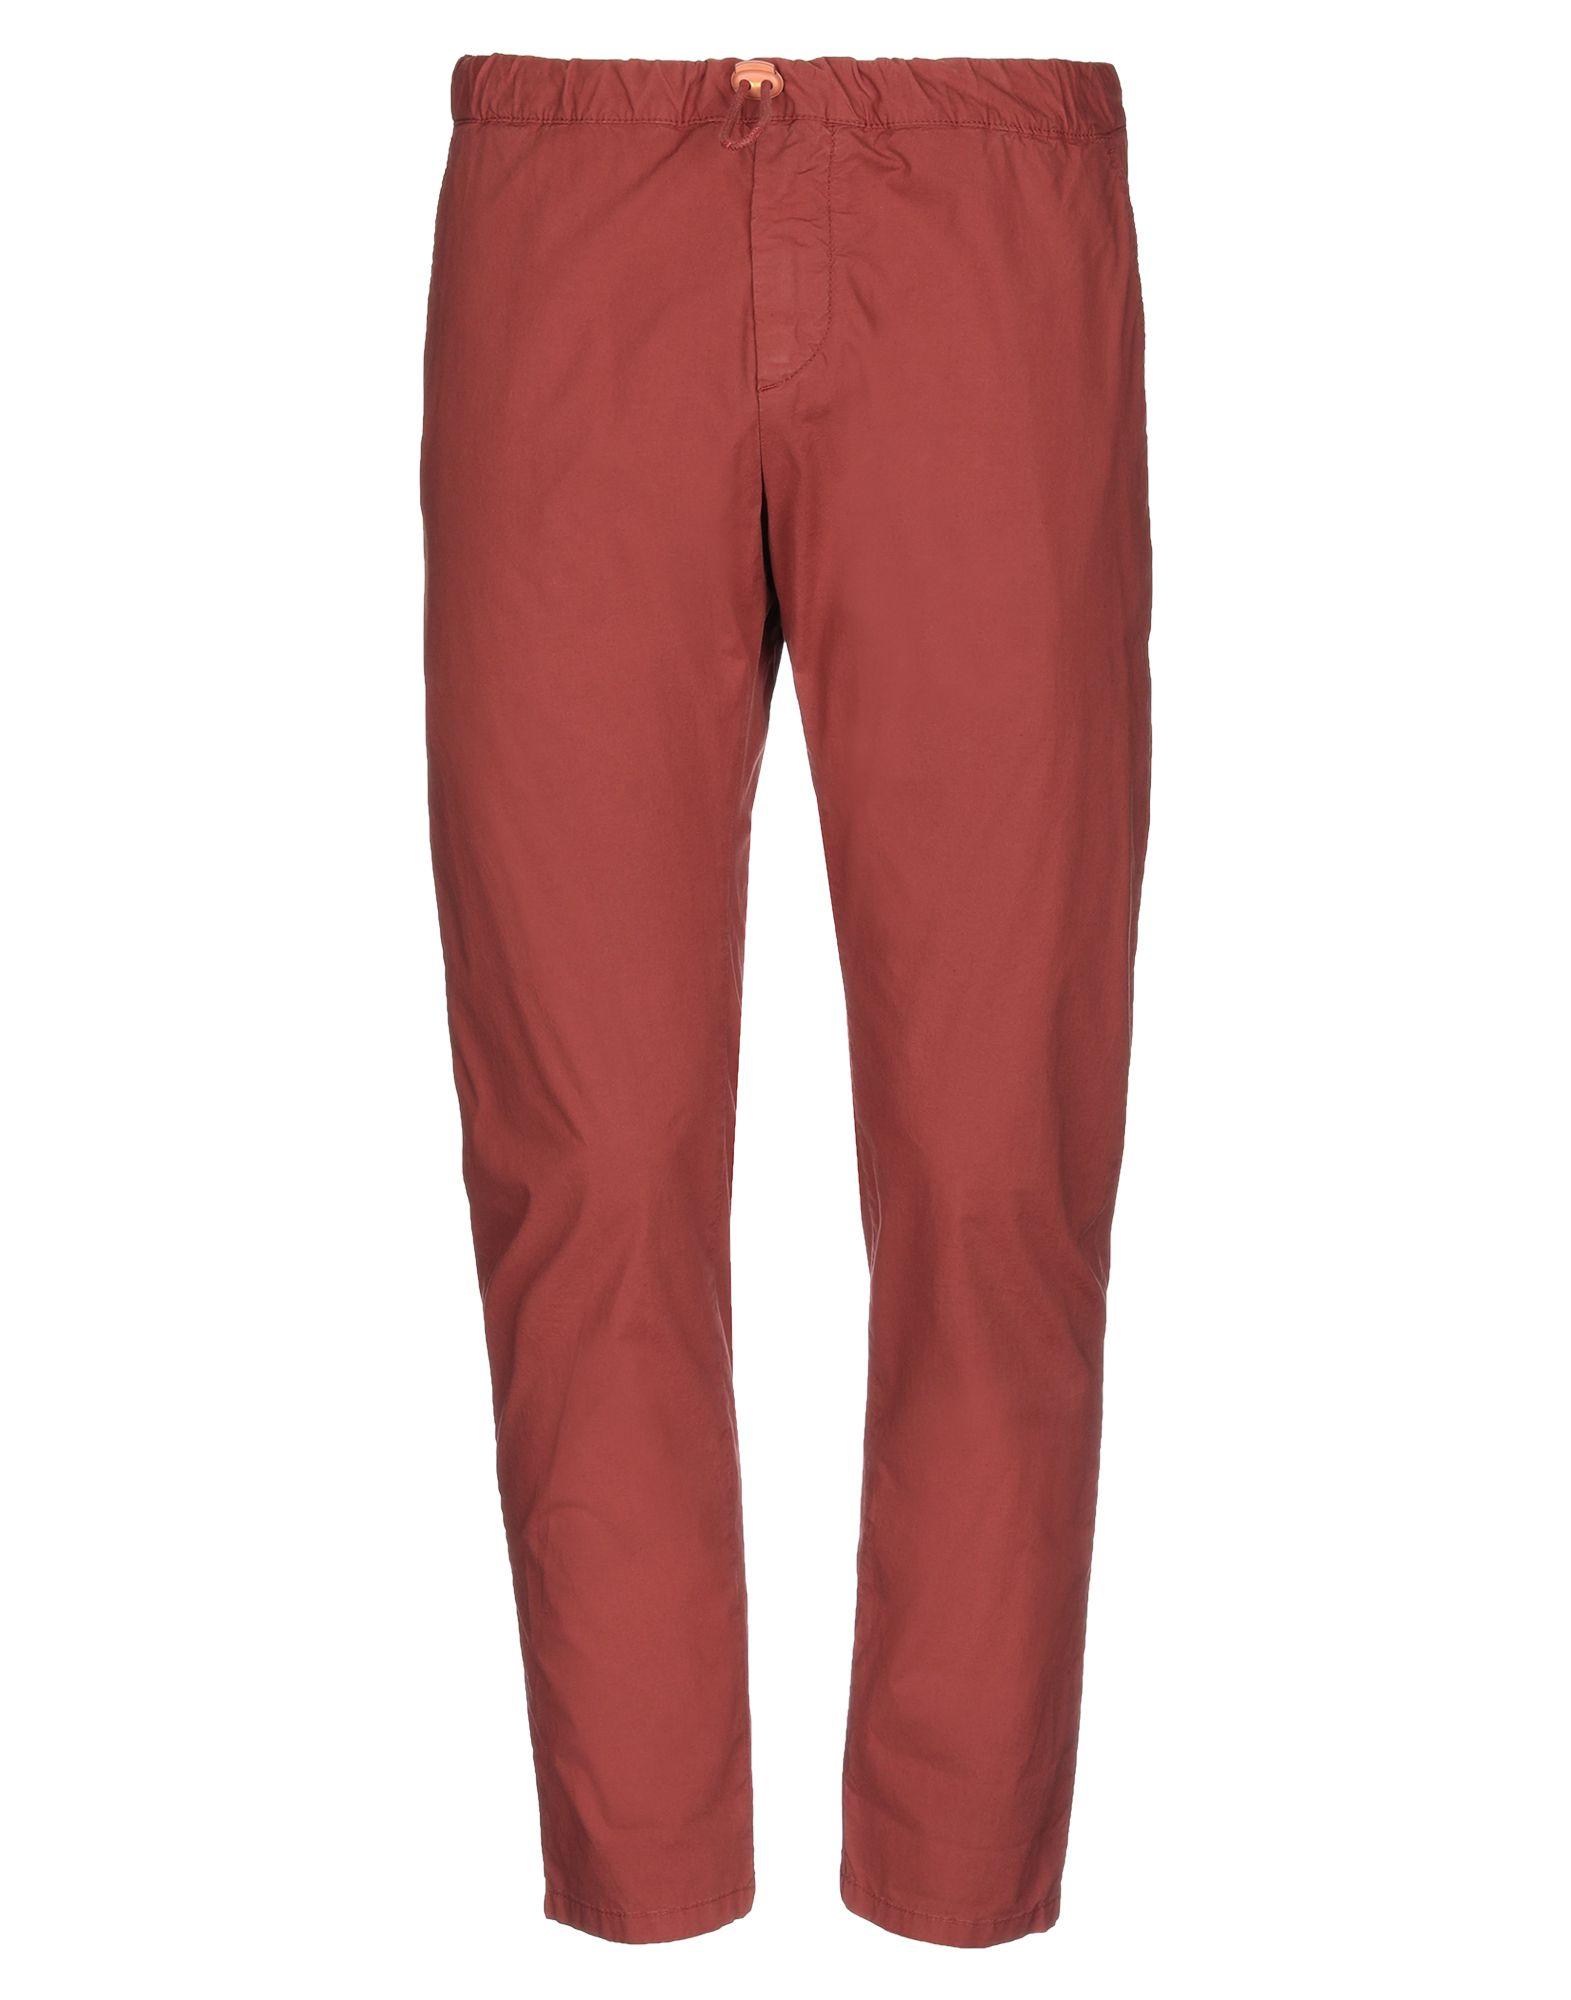 BICOLORE® Повседневные брюки bicolore® повседневные брюки